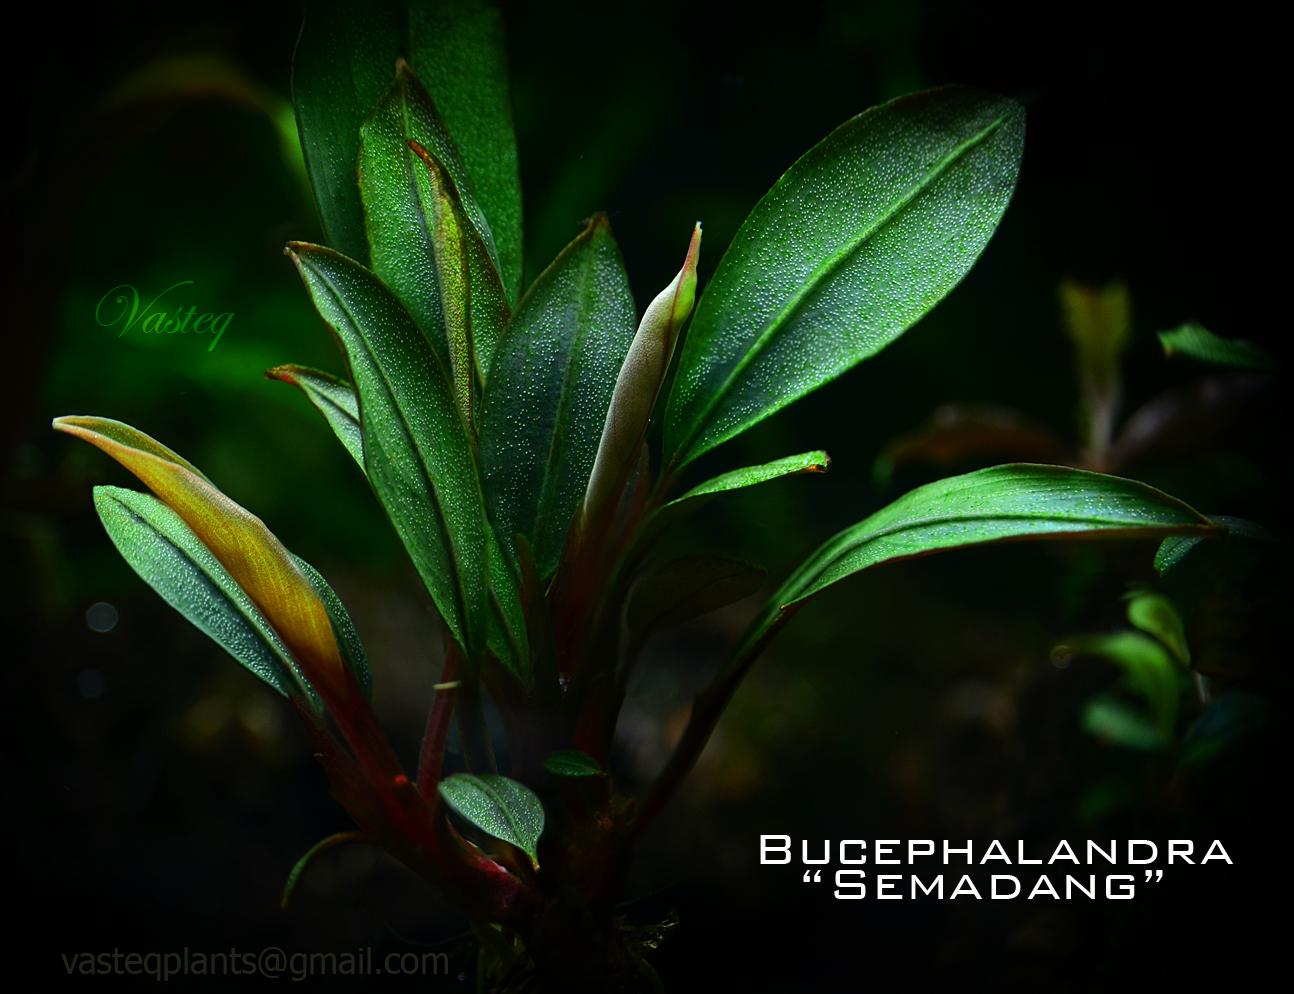 Bucephalandra 'Semadang'